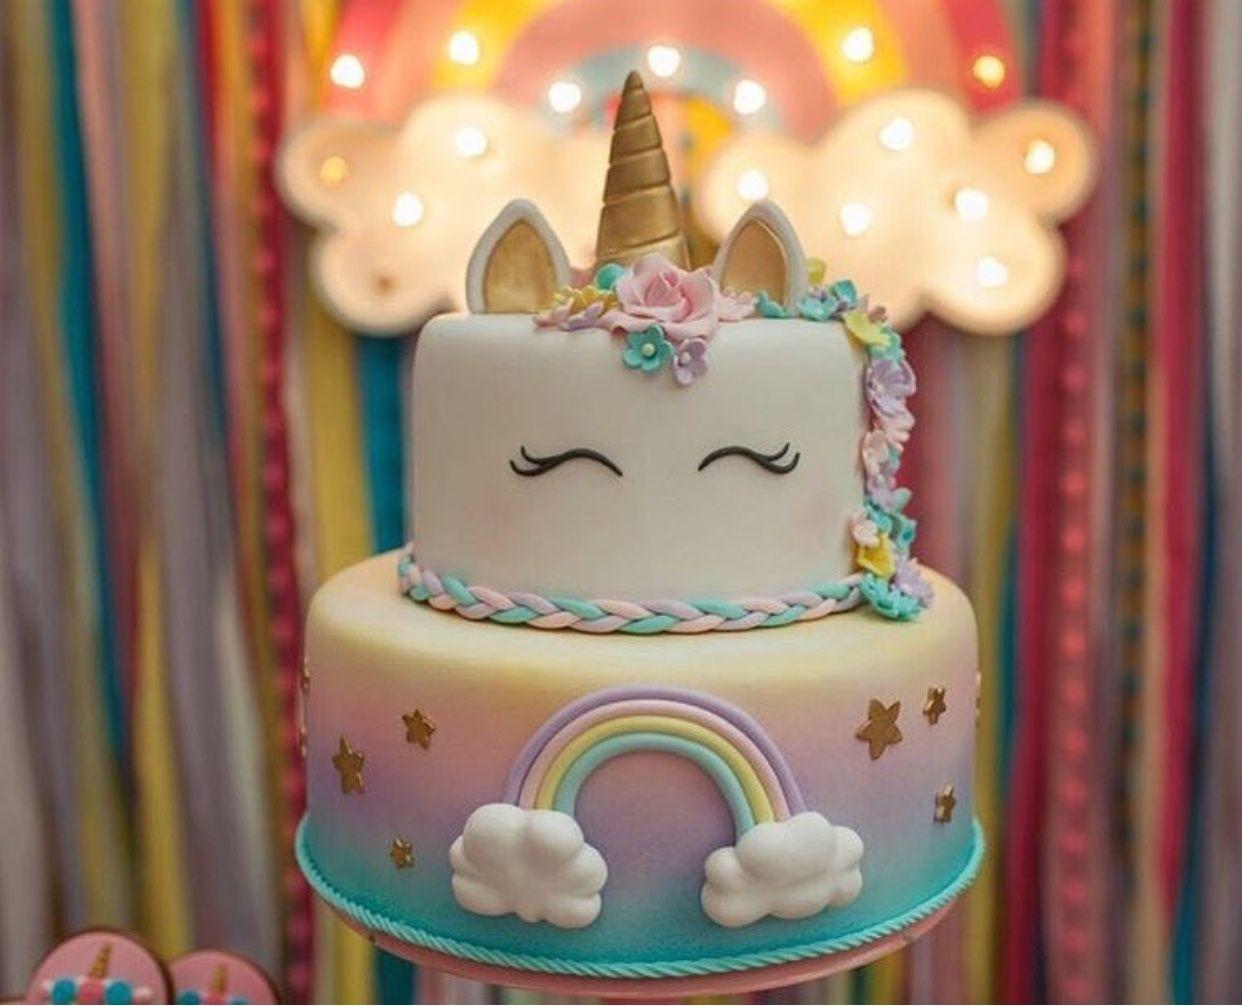 Pin by Maisa brandao on bolos Pinterest Unicorns Cake and Birthdays